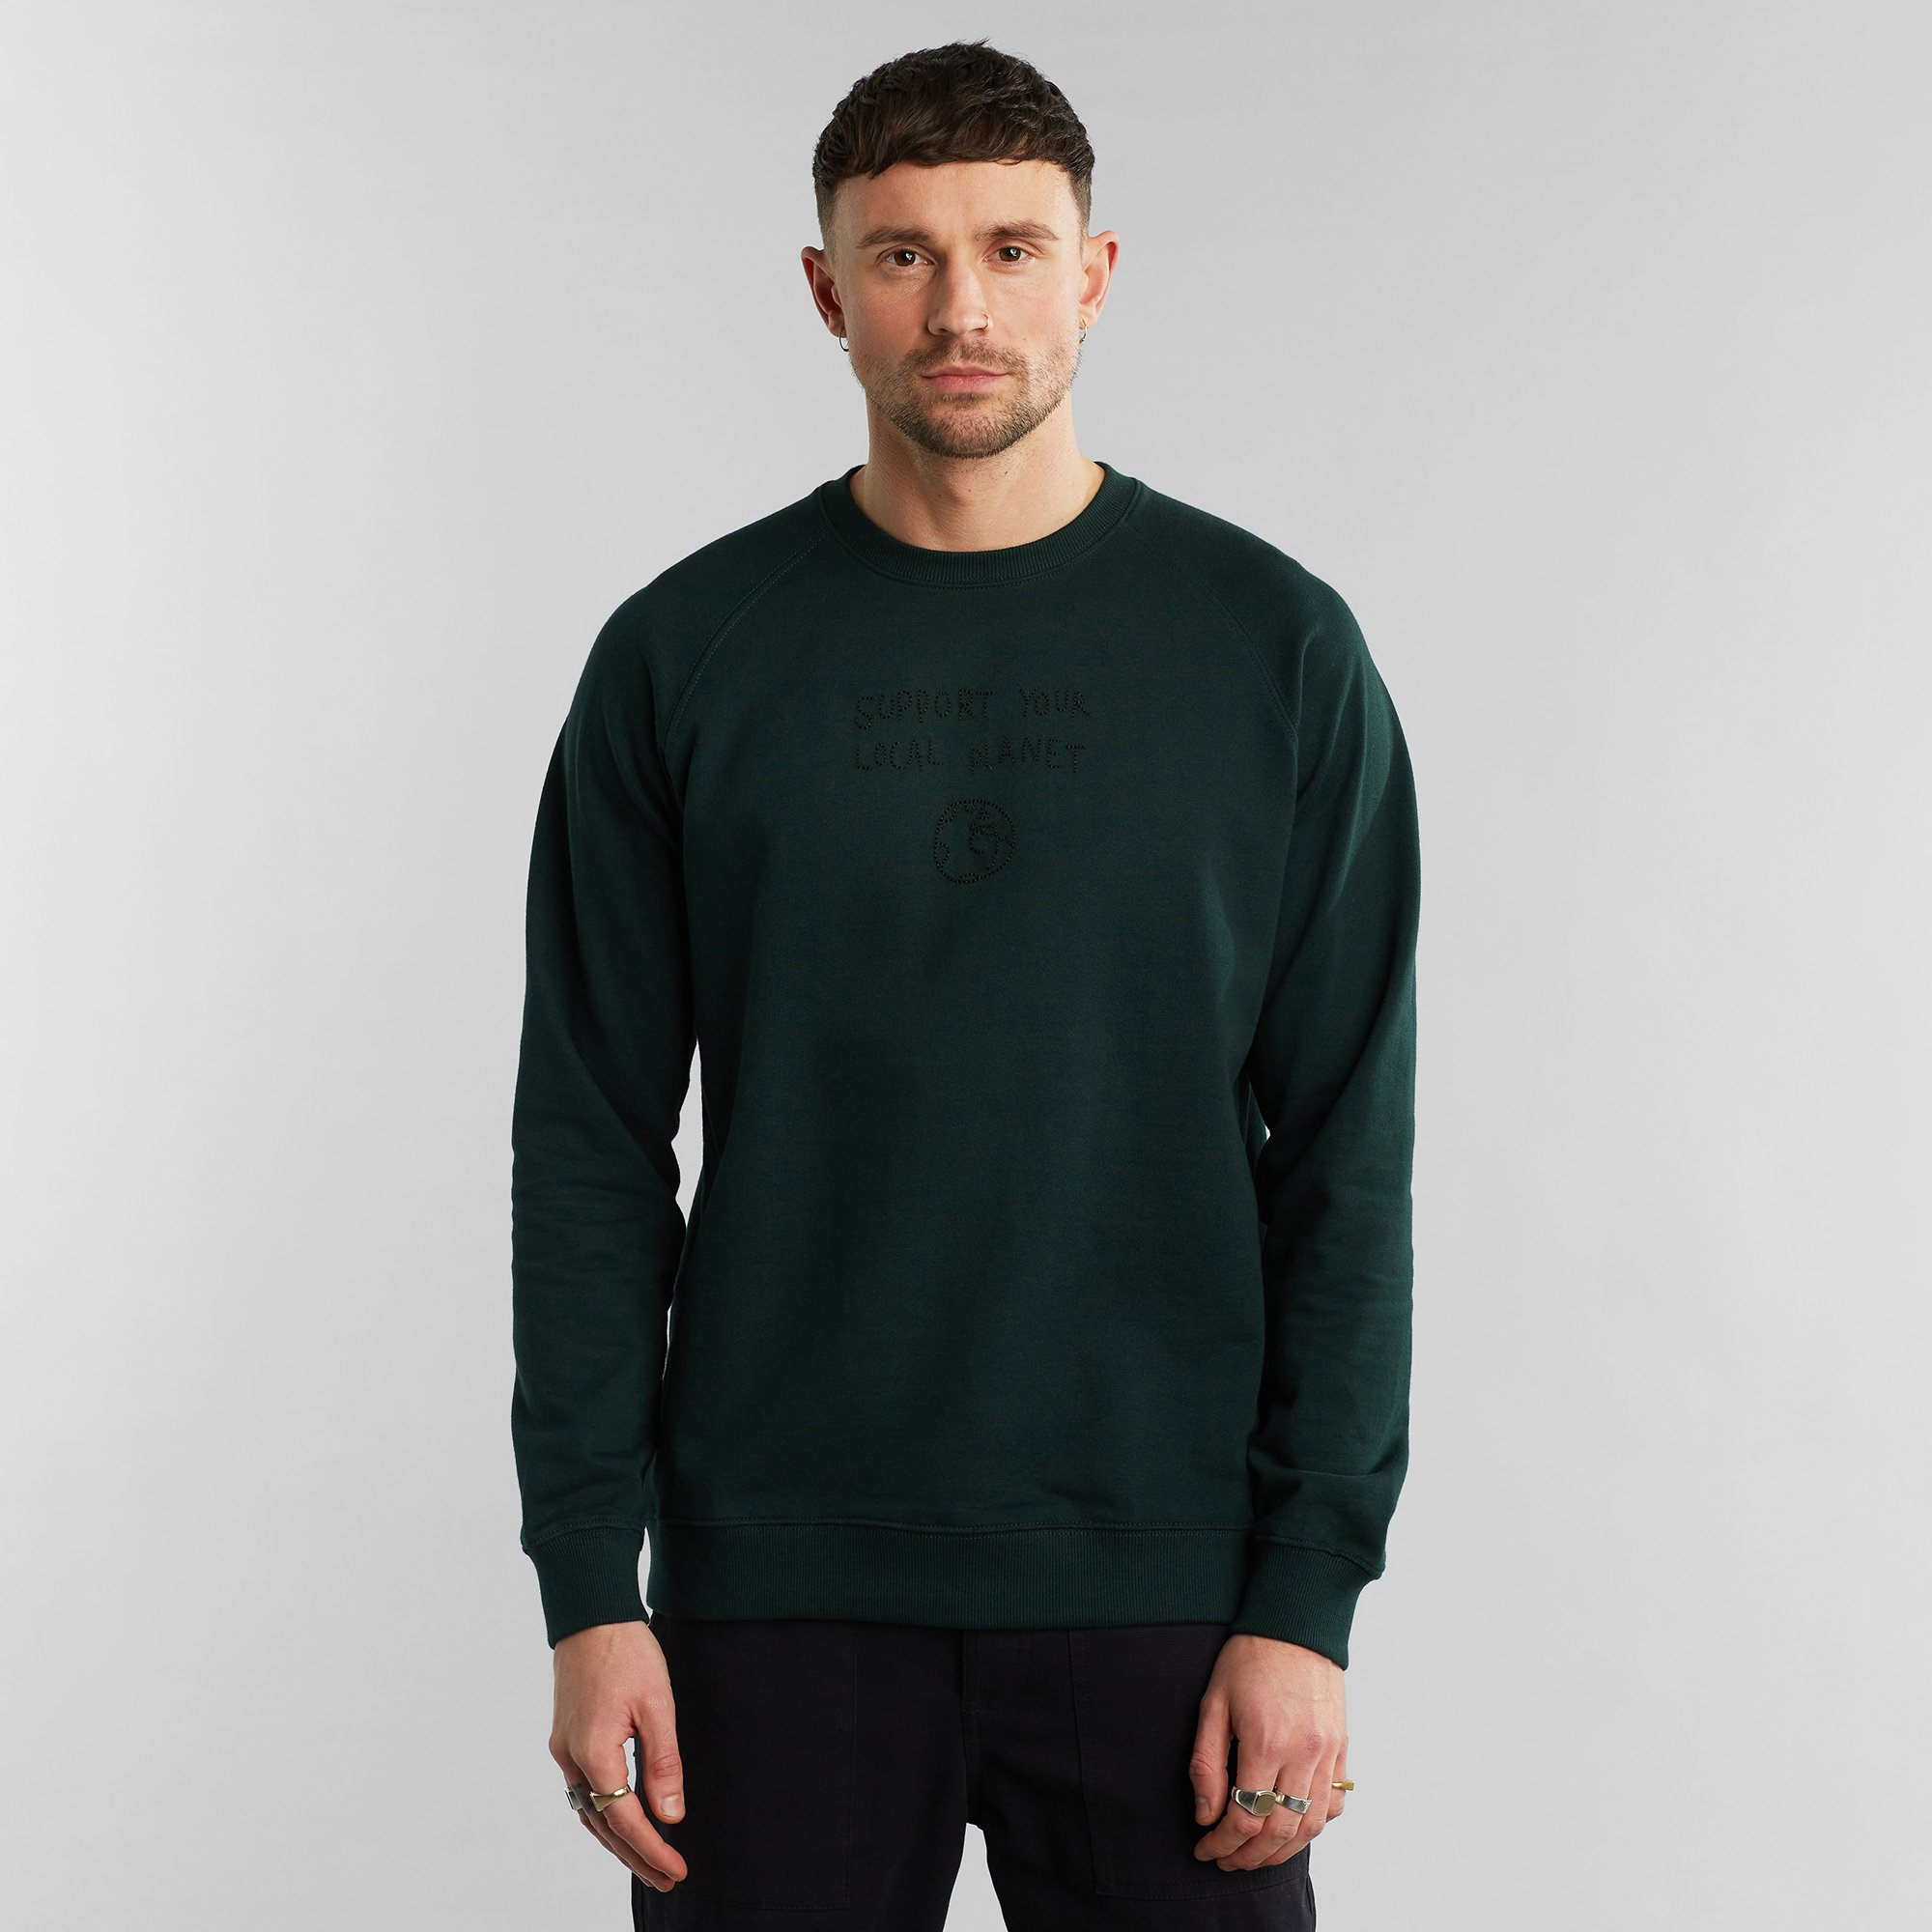 DEDICATED-MALMOE-SUPPORT-YOUR-LOCAL-PLANET-Sweatshirt-dark-green-pine-grove